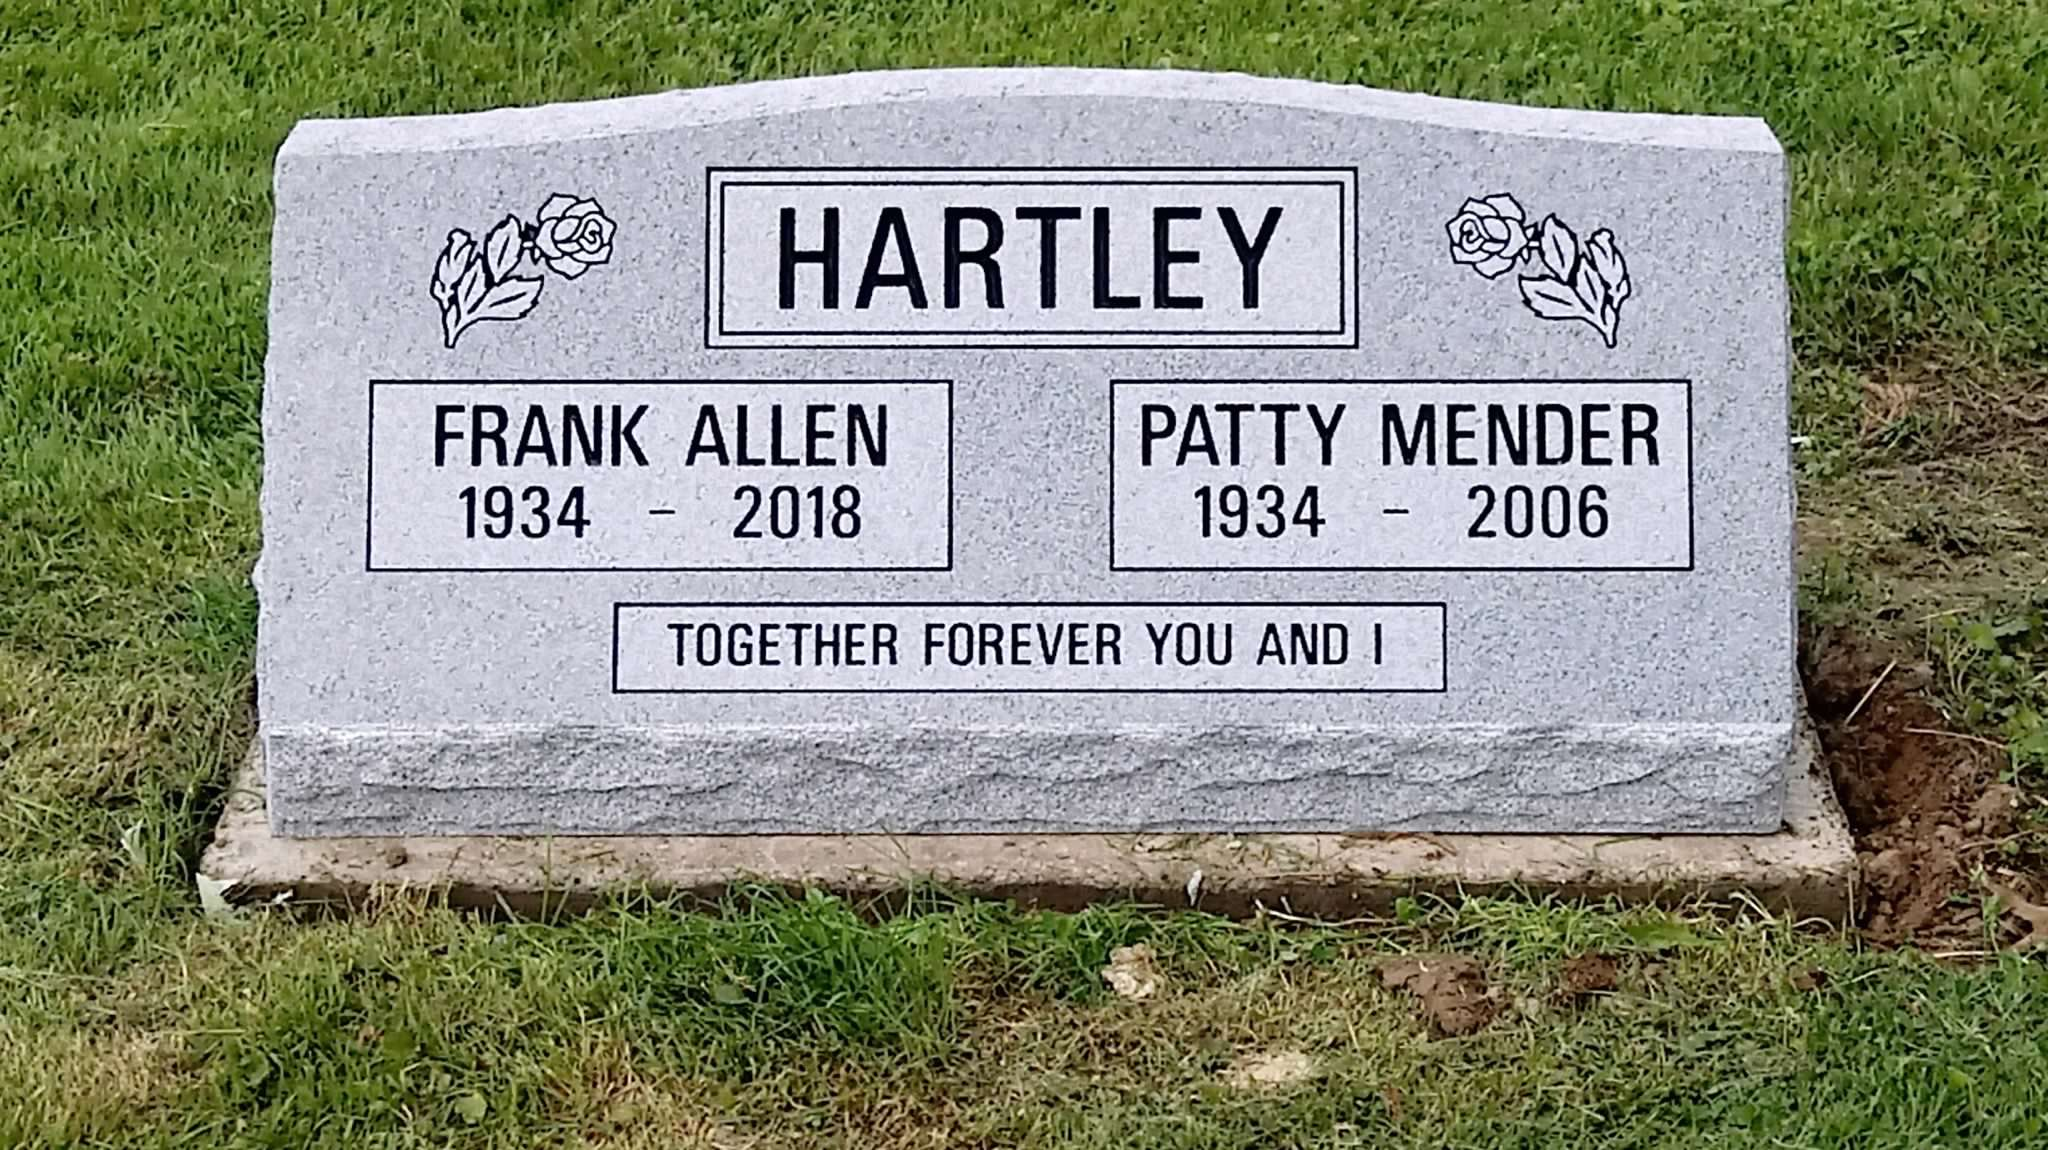 Hartley, Frank